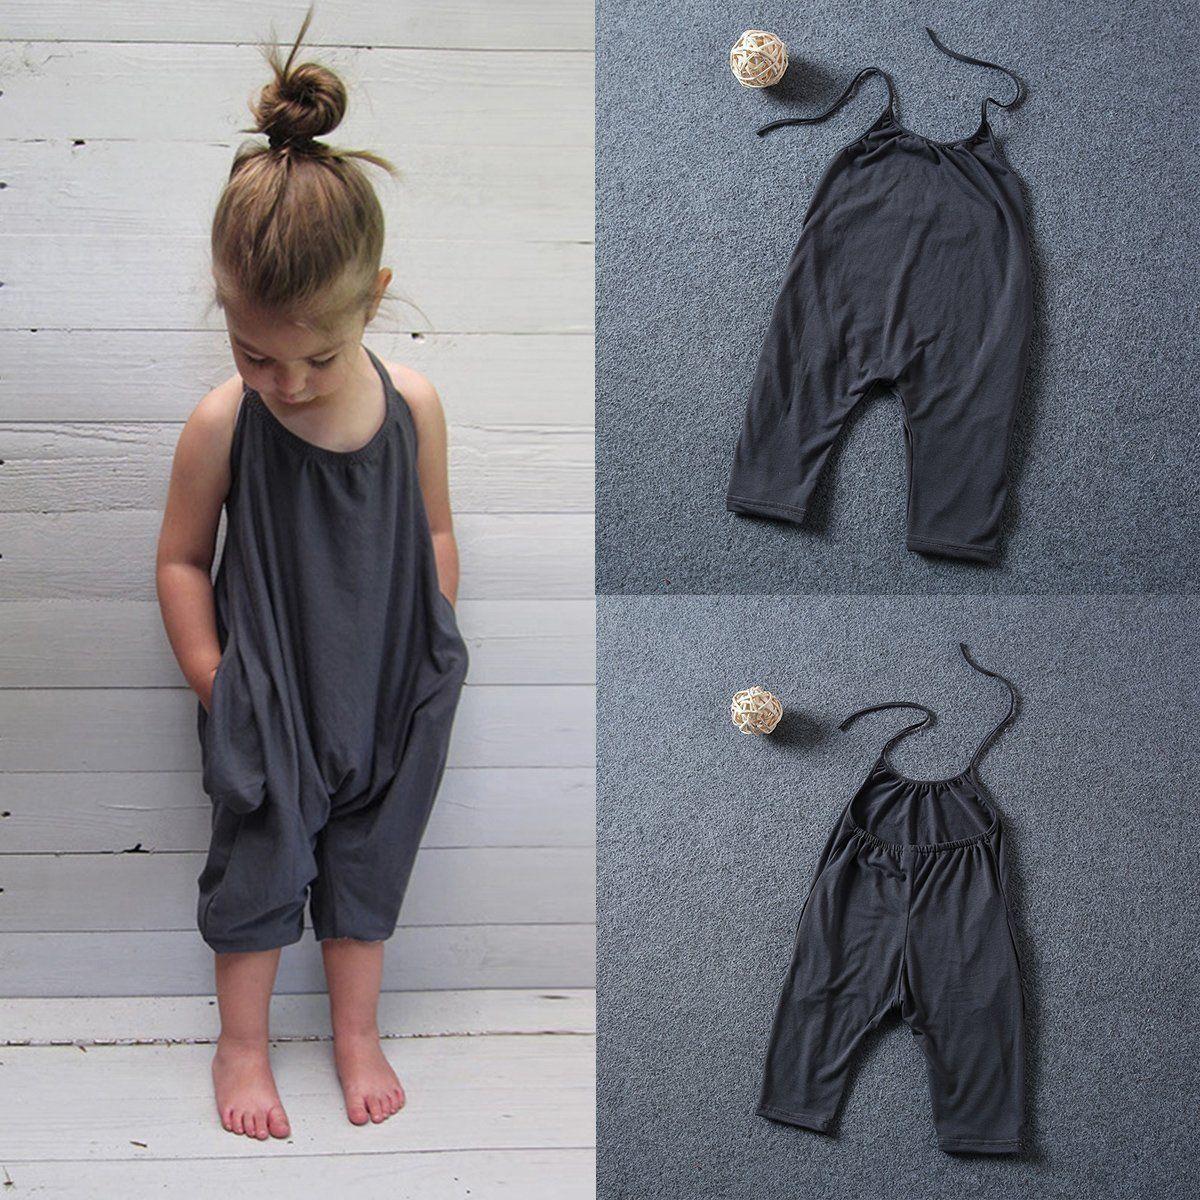 Newborn Infant Baby Girl Floral Strap Jumpsuit-Romper Harem Pants Clothes Outfit